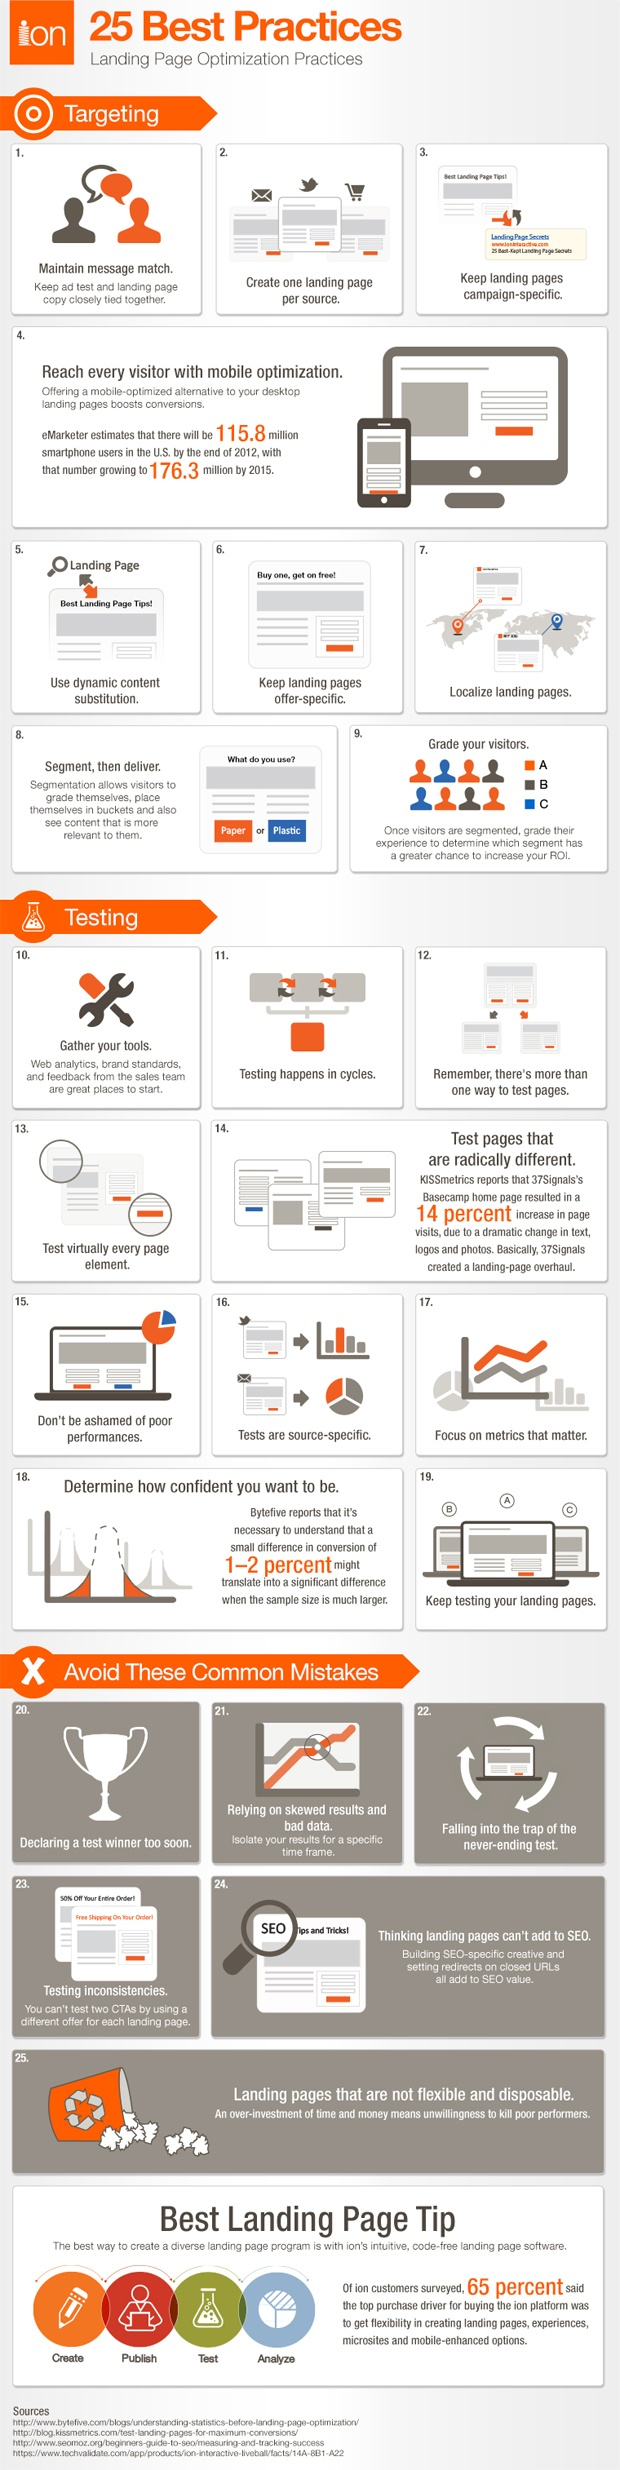 25 Landing Page Best Practices | 25 практики за оптимизиране на лендинг страници